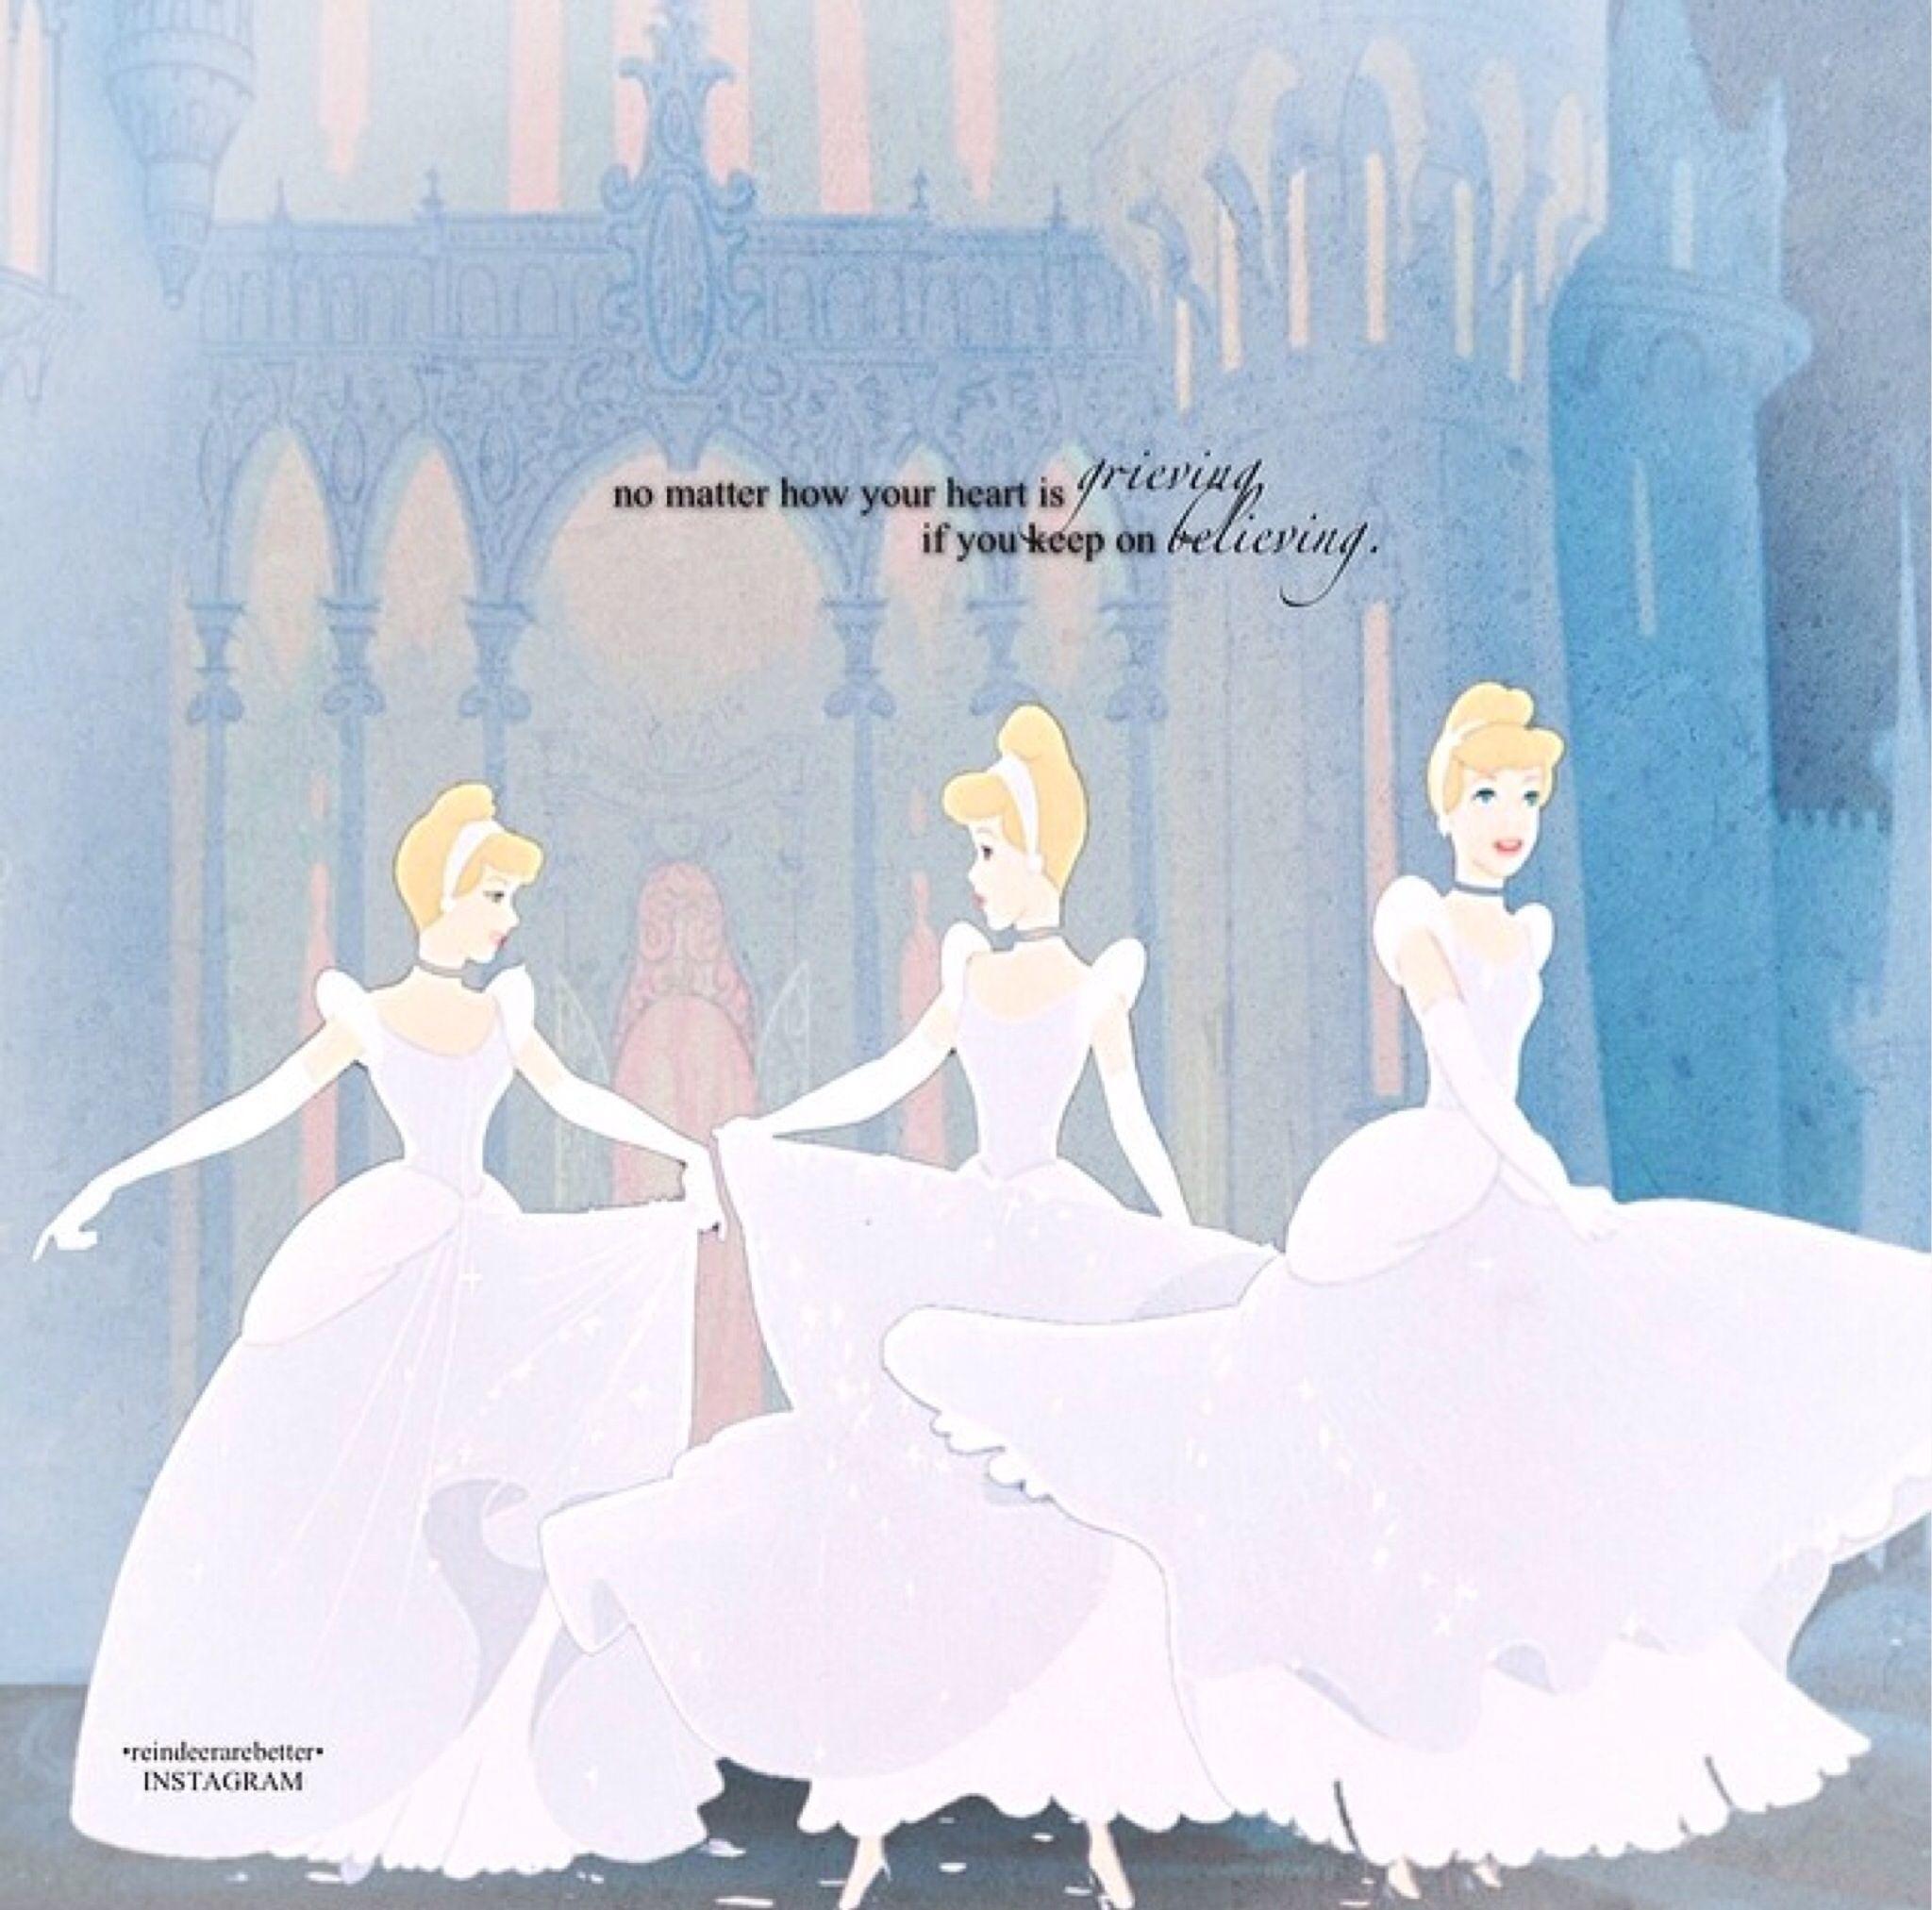 Cinderella song lyrics in a movie poster #familyentertainment Peckosh Pediatric Dentistry | #Dubuque | #IA | http://peckoshpediatricdentistry.com/